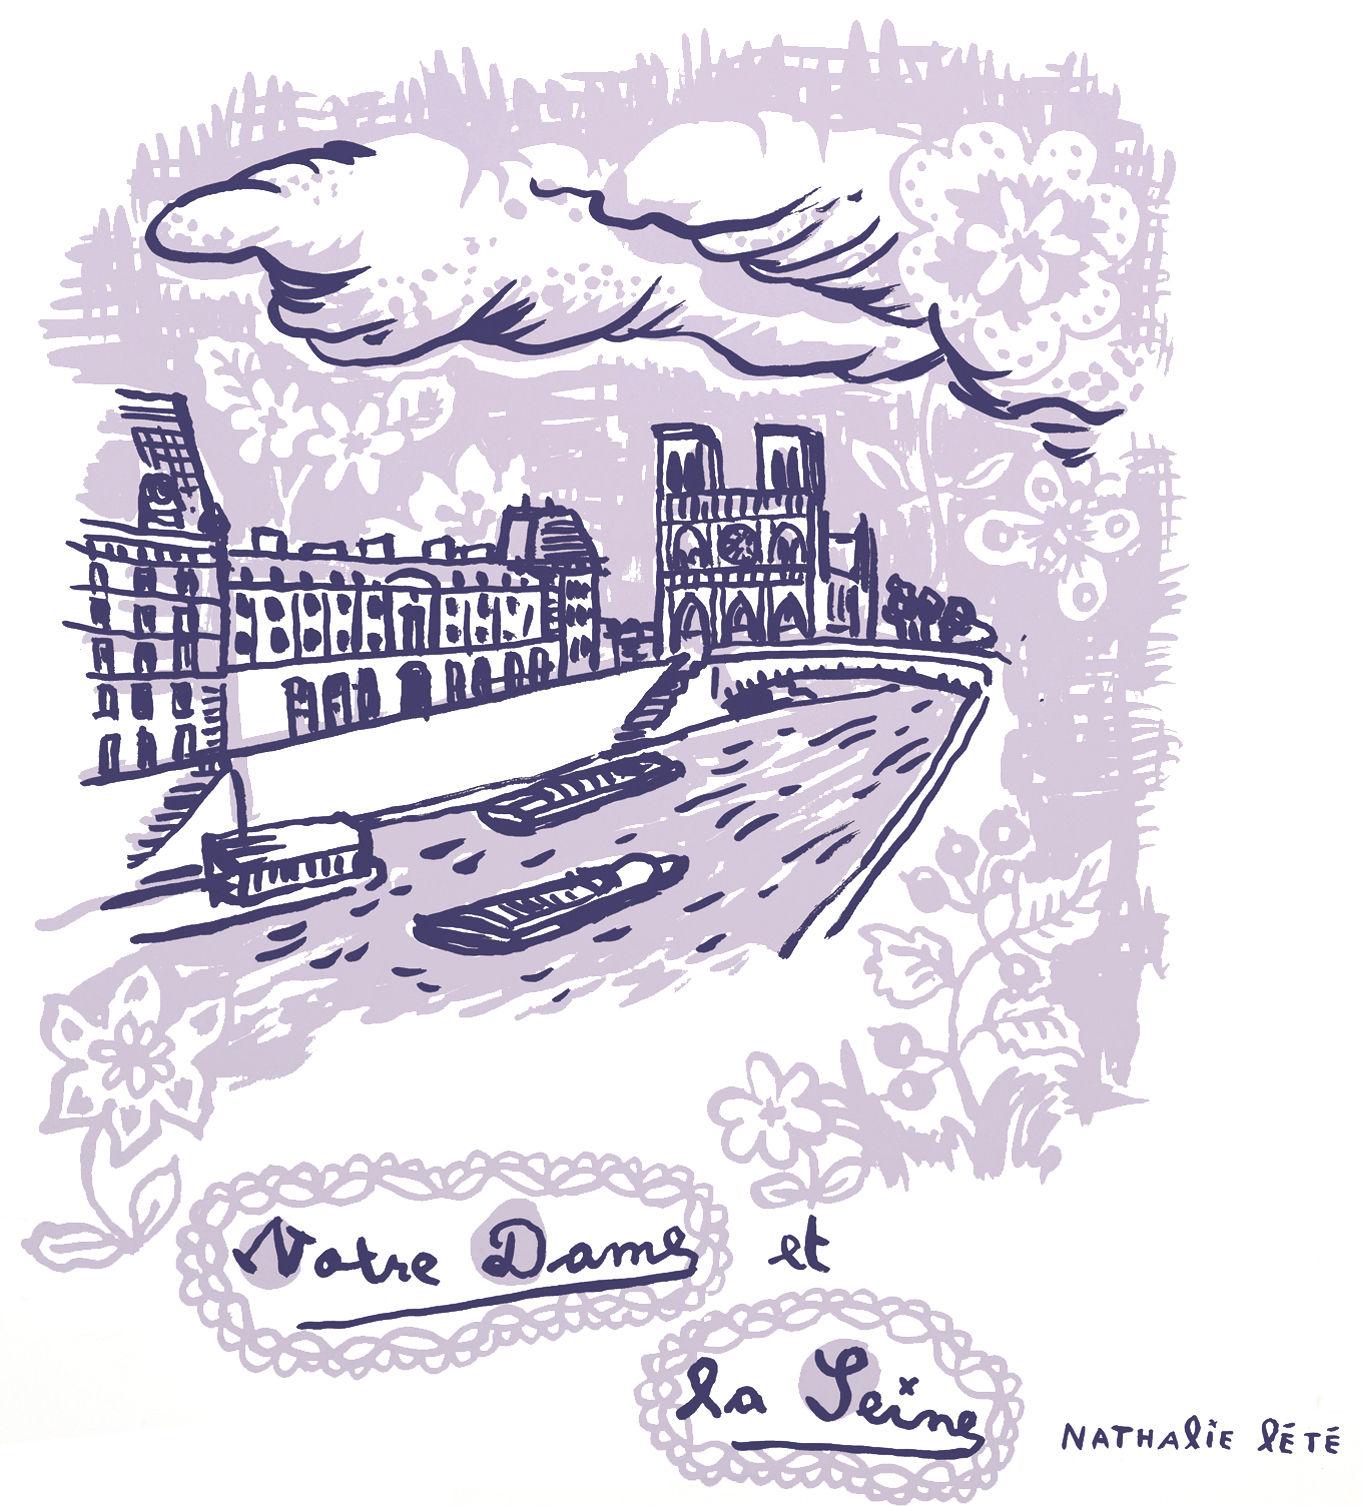 Decoration - Children's Home Accessories - Notre dame Sticker - 25 x 25 cm by Domestic - Purple - Vinyl